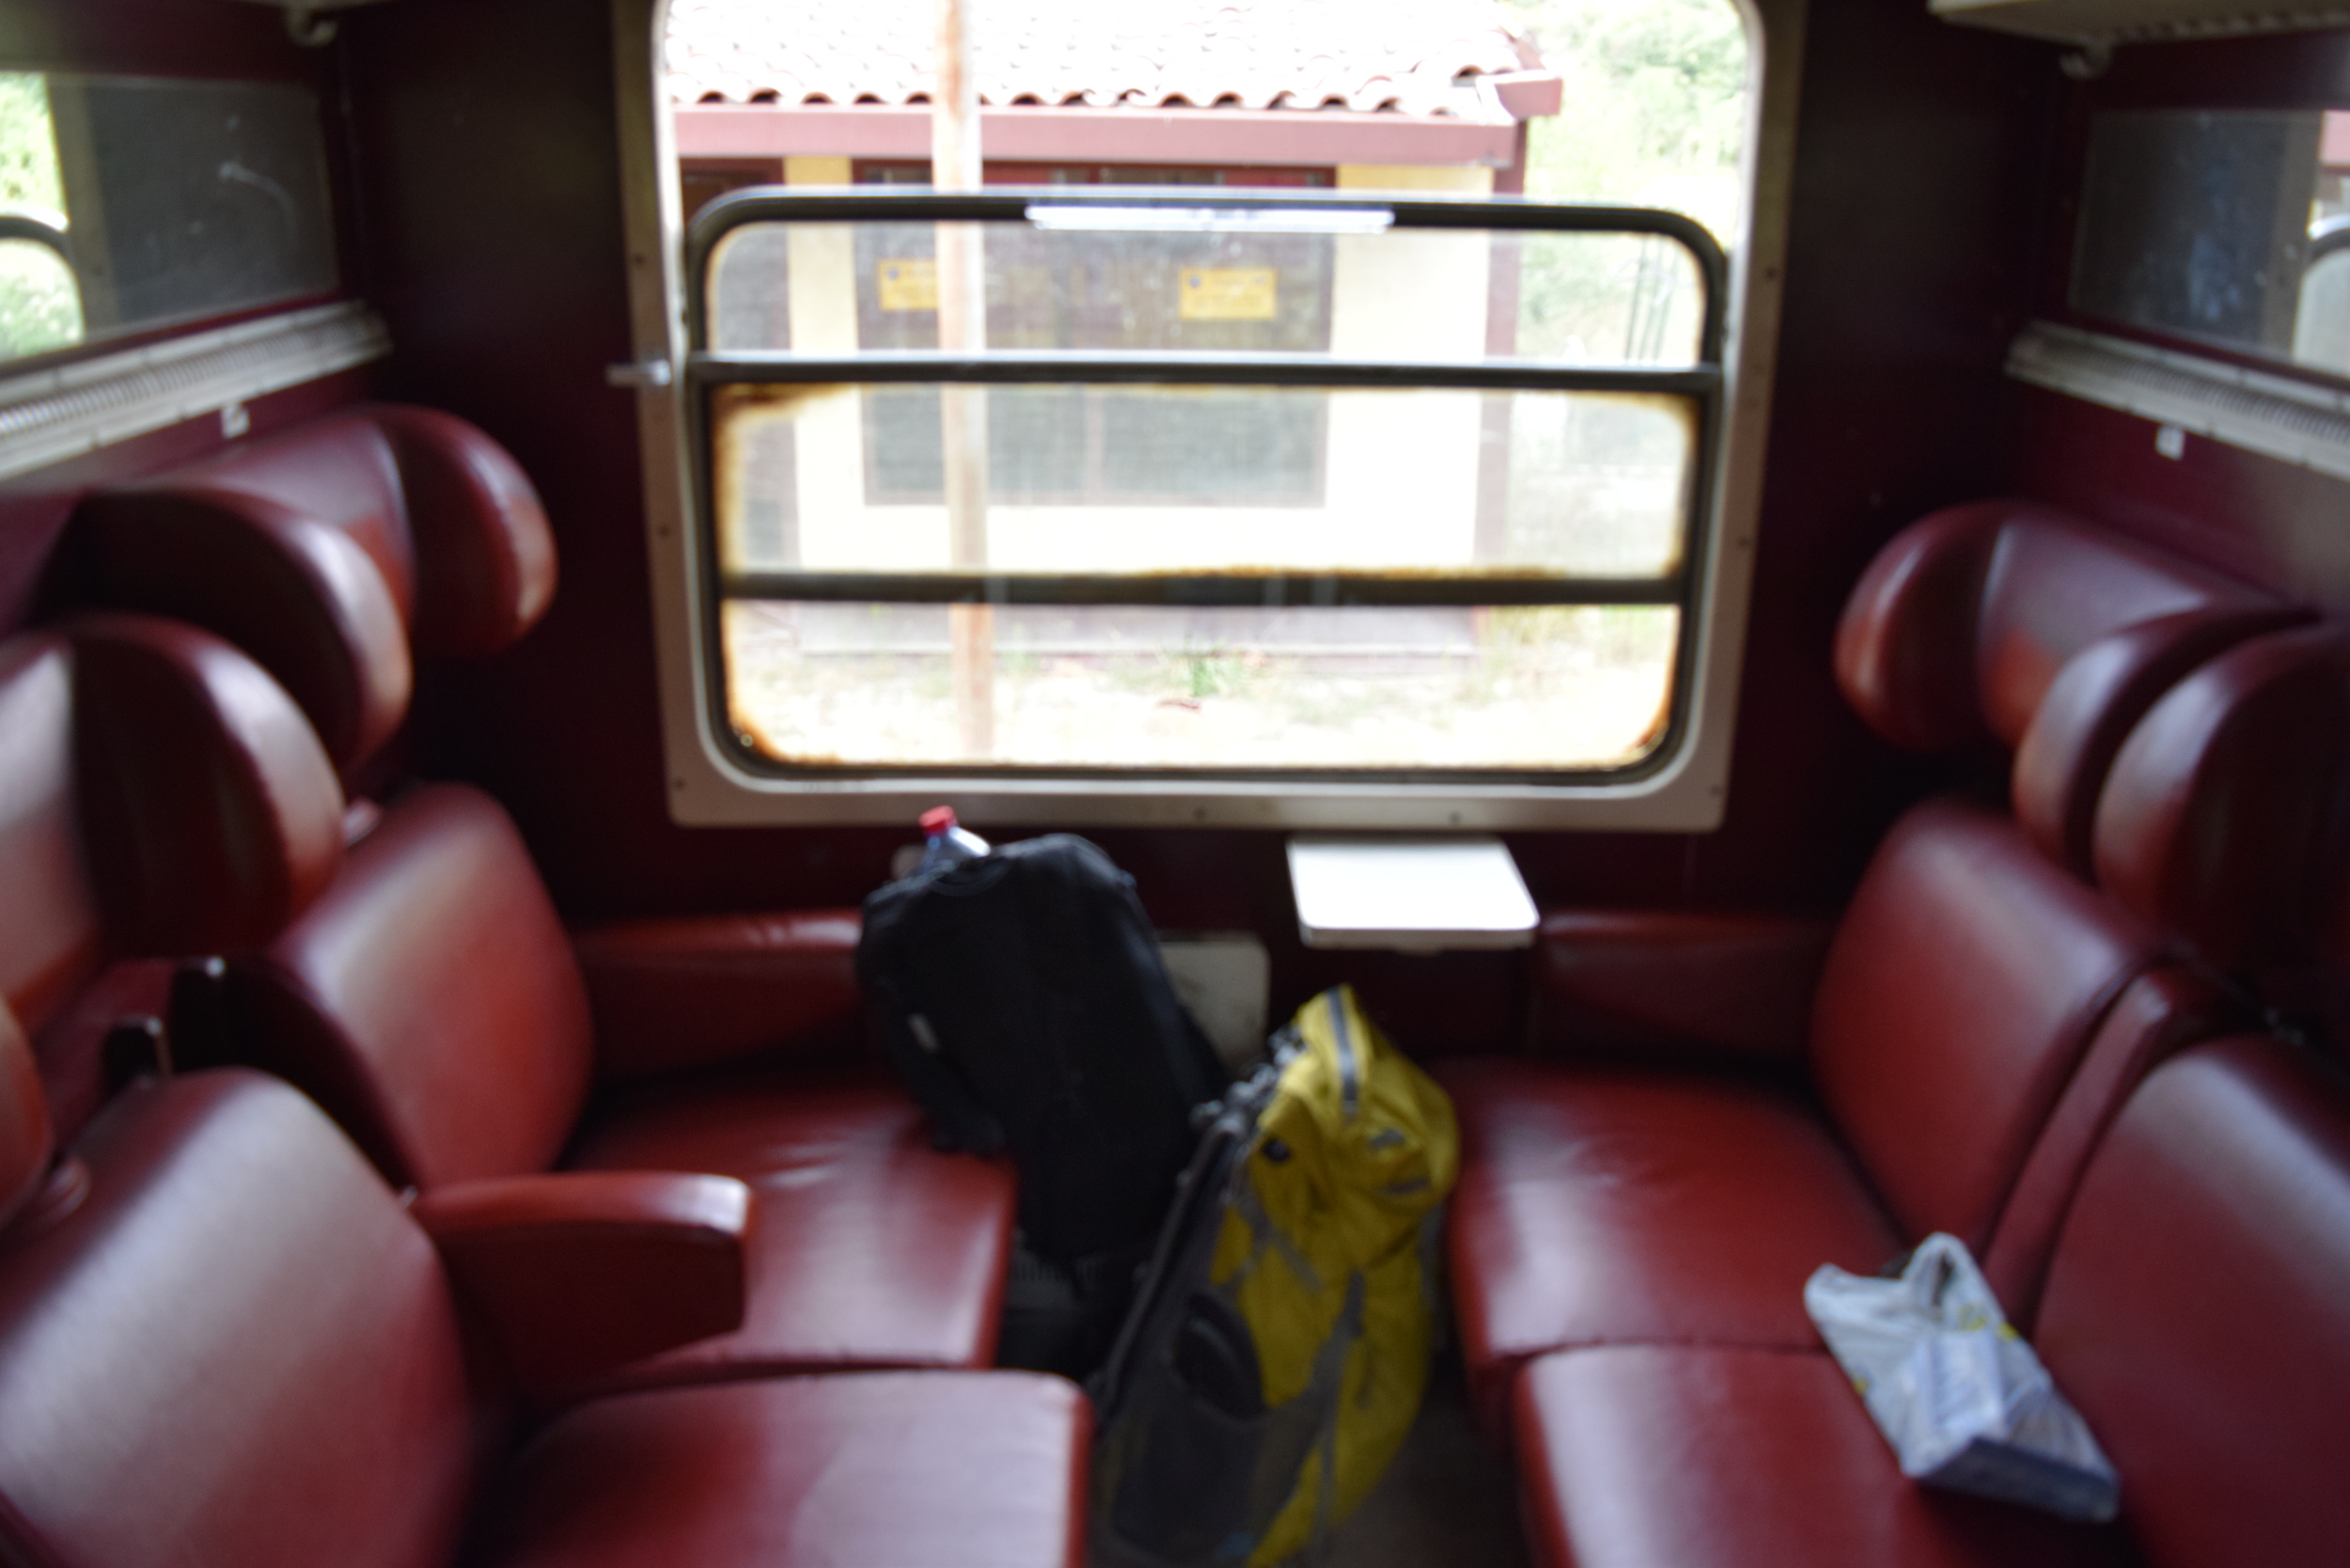 Inside the Macedonian train car